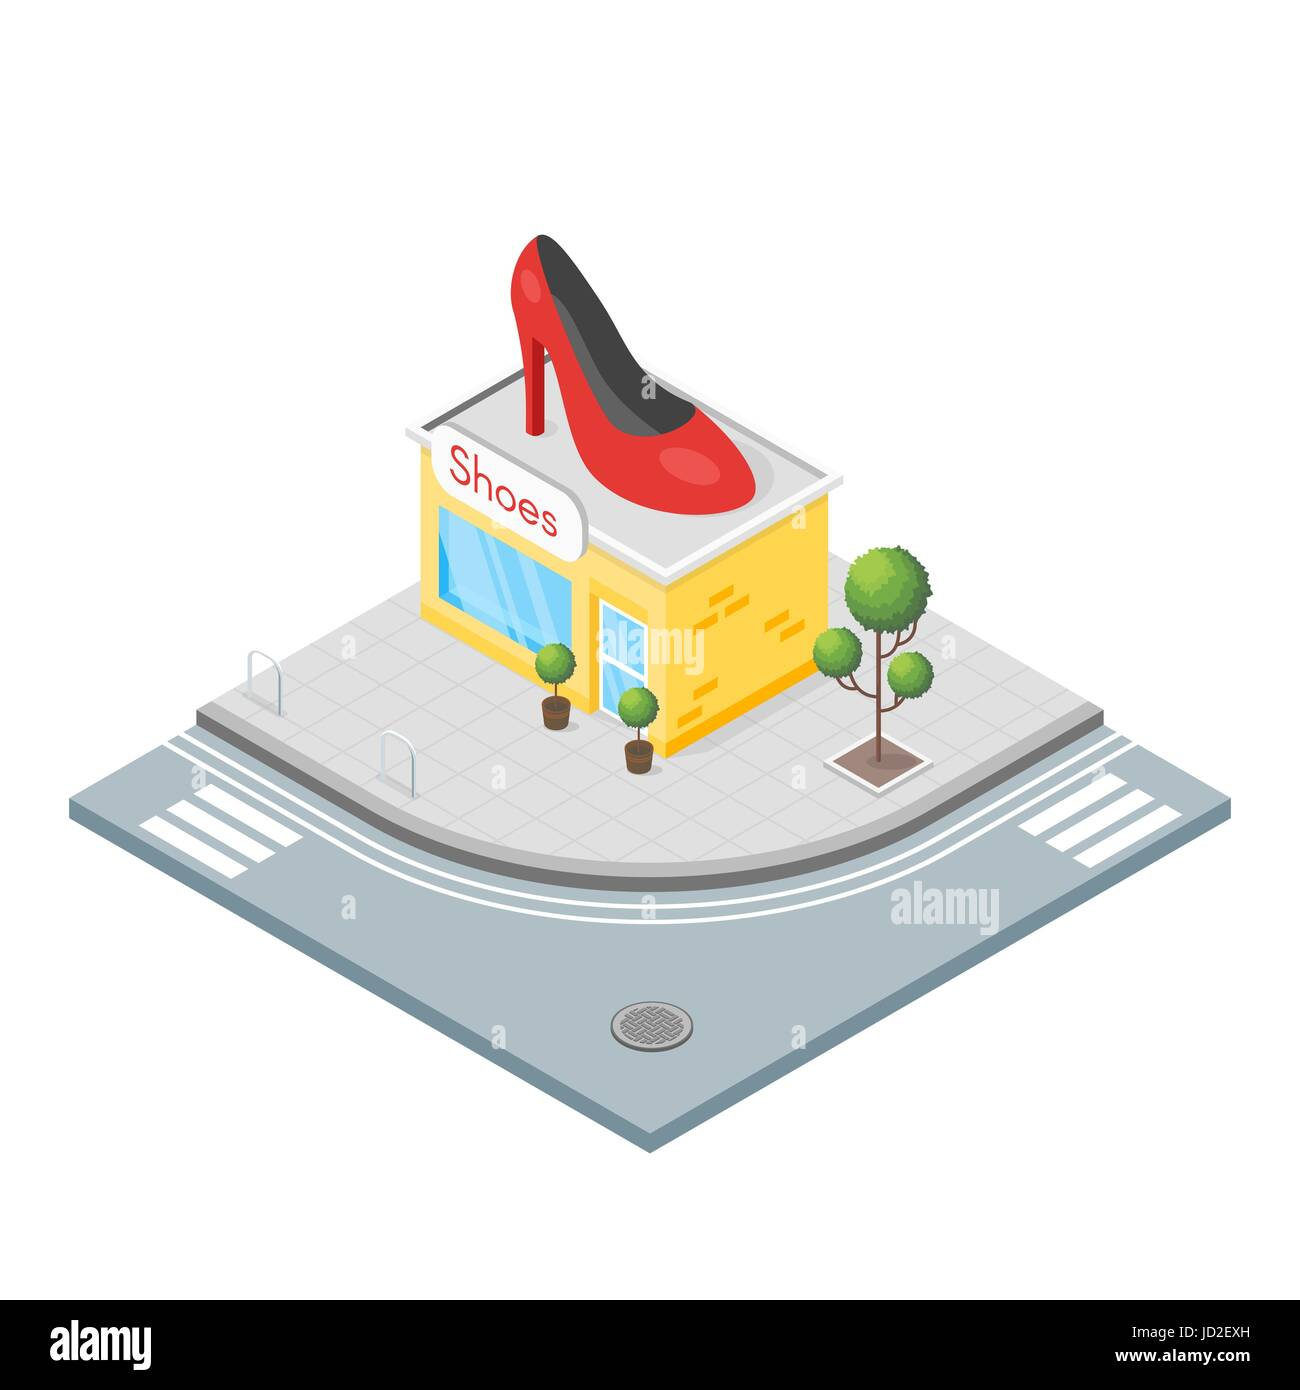 https://c8.alamy.com/comp/JD2EXH/isometric-3d-illustration-of-shoes-shop-high-heel-shoe-on-the-top-JD2EXH.jpg